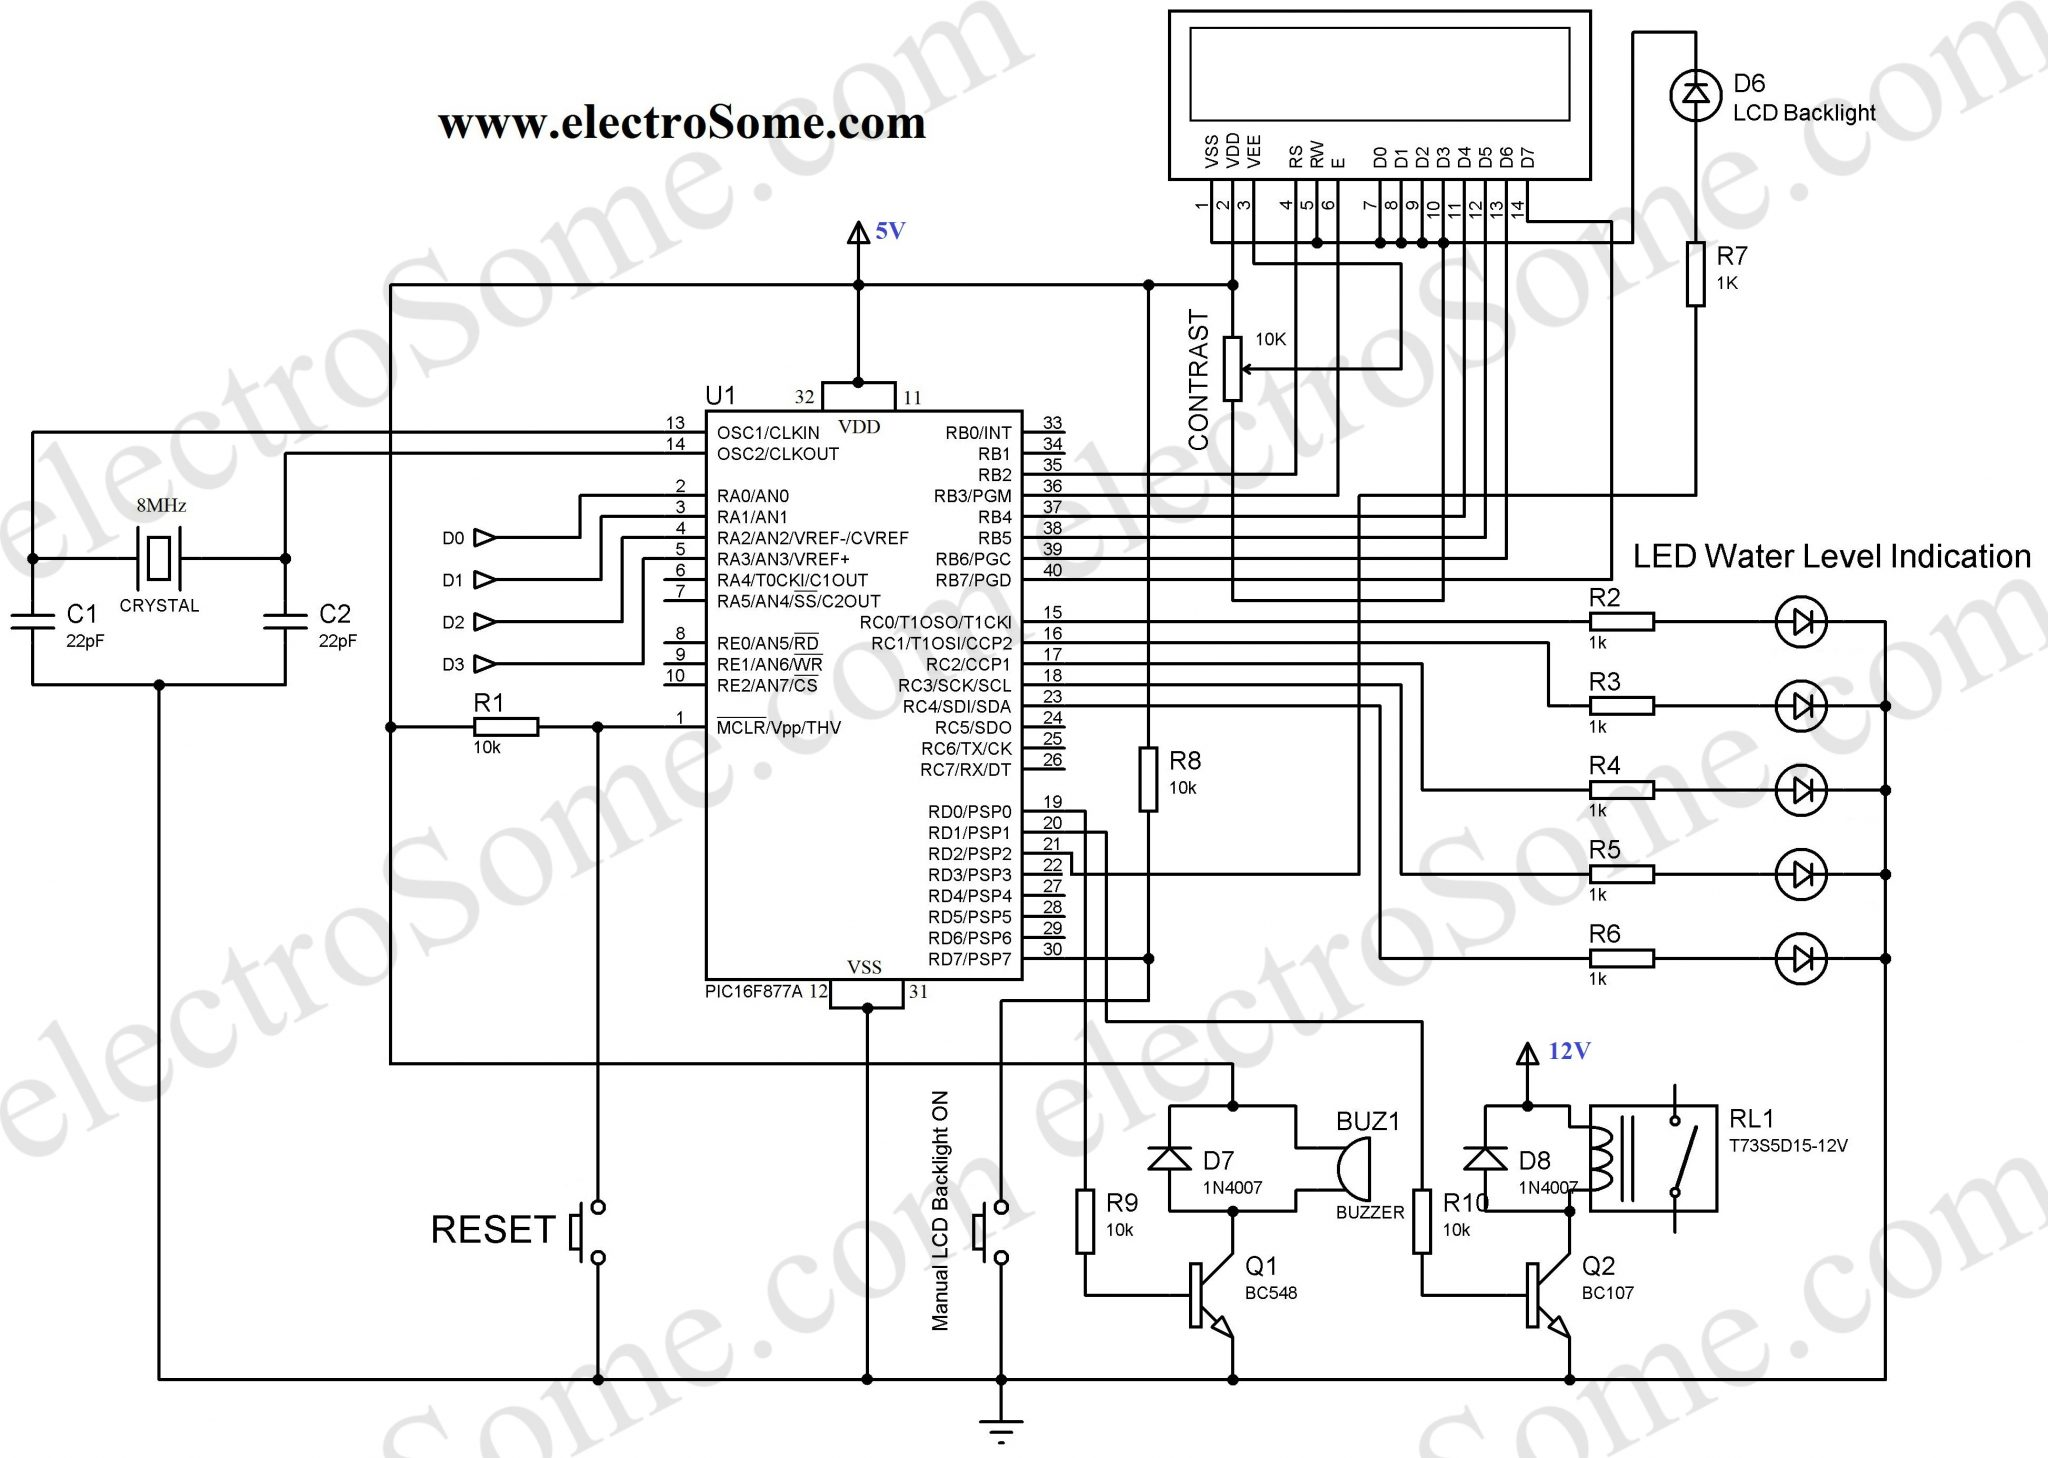 Honeywell Motorized Zone Valve Wiring Diagram. 2164